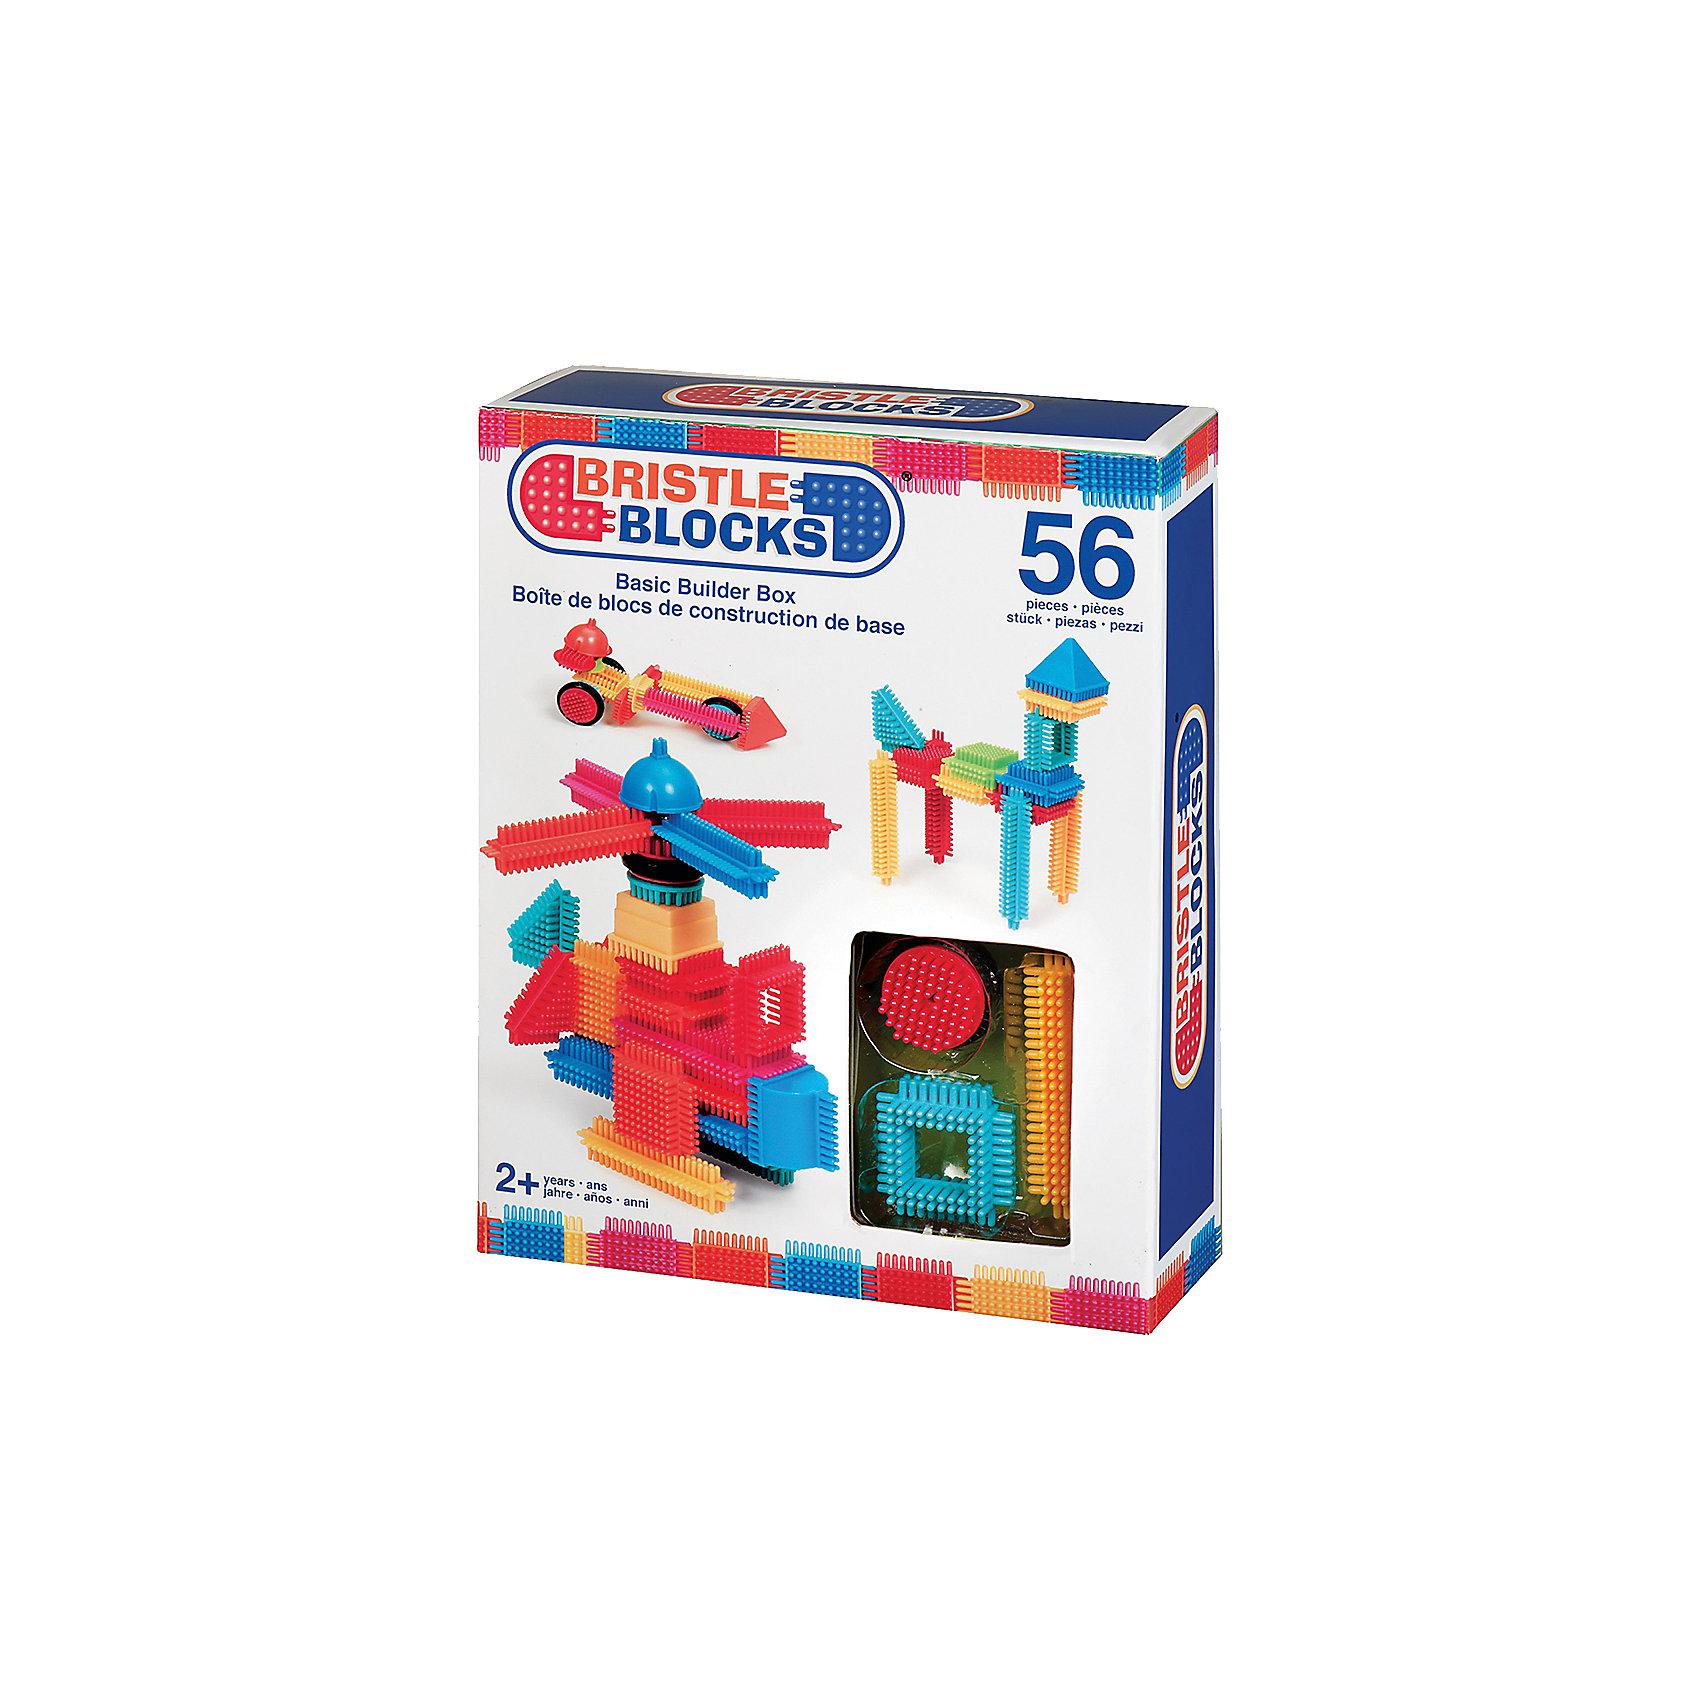 ����������� ���������� � �������, 56 �������, Bristle Blocks (-)